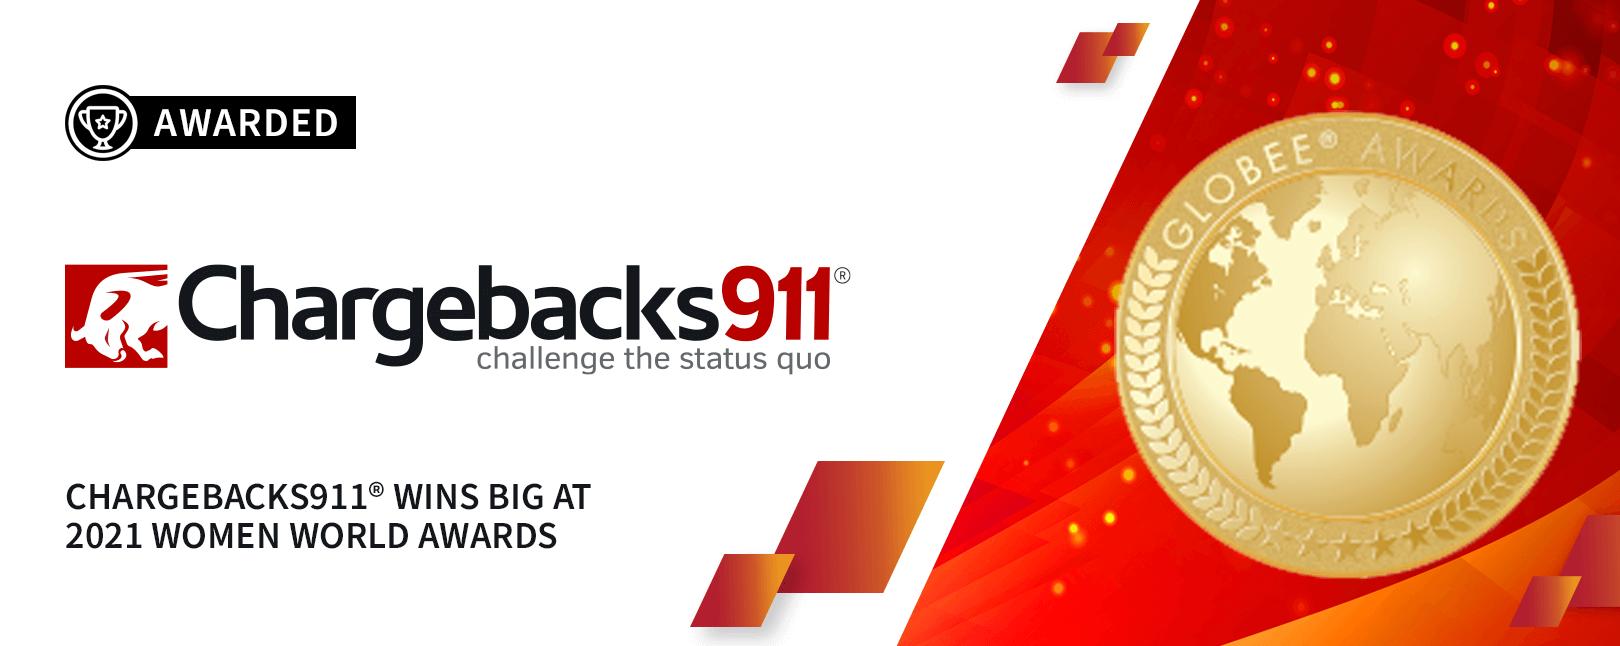 Chargebacks911® Wins Big at 2021 Women World Awards